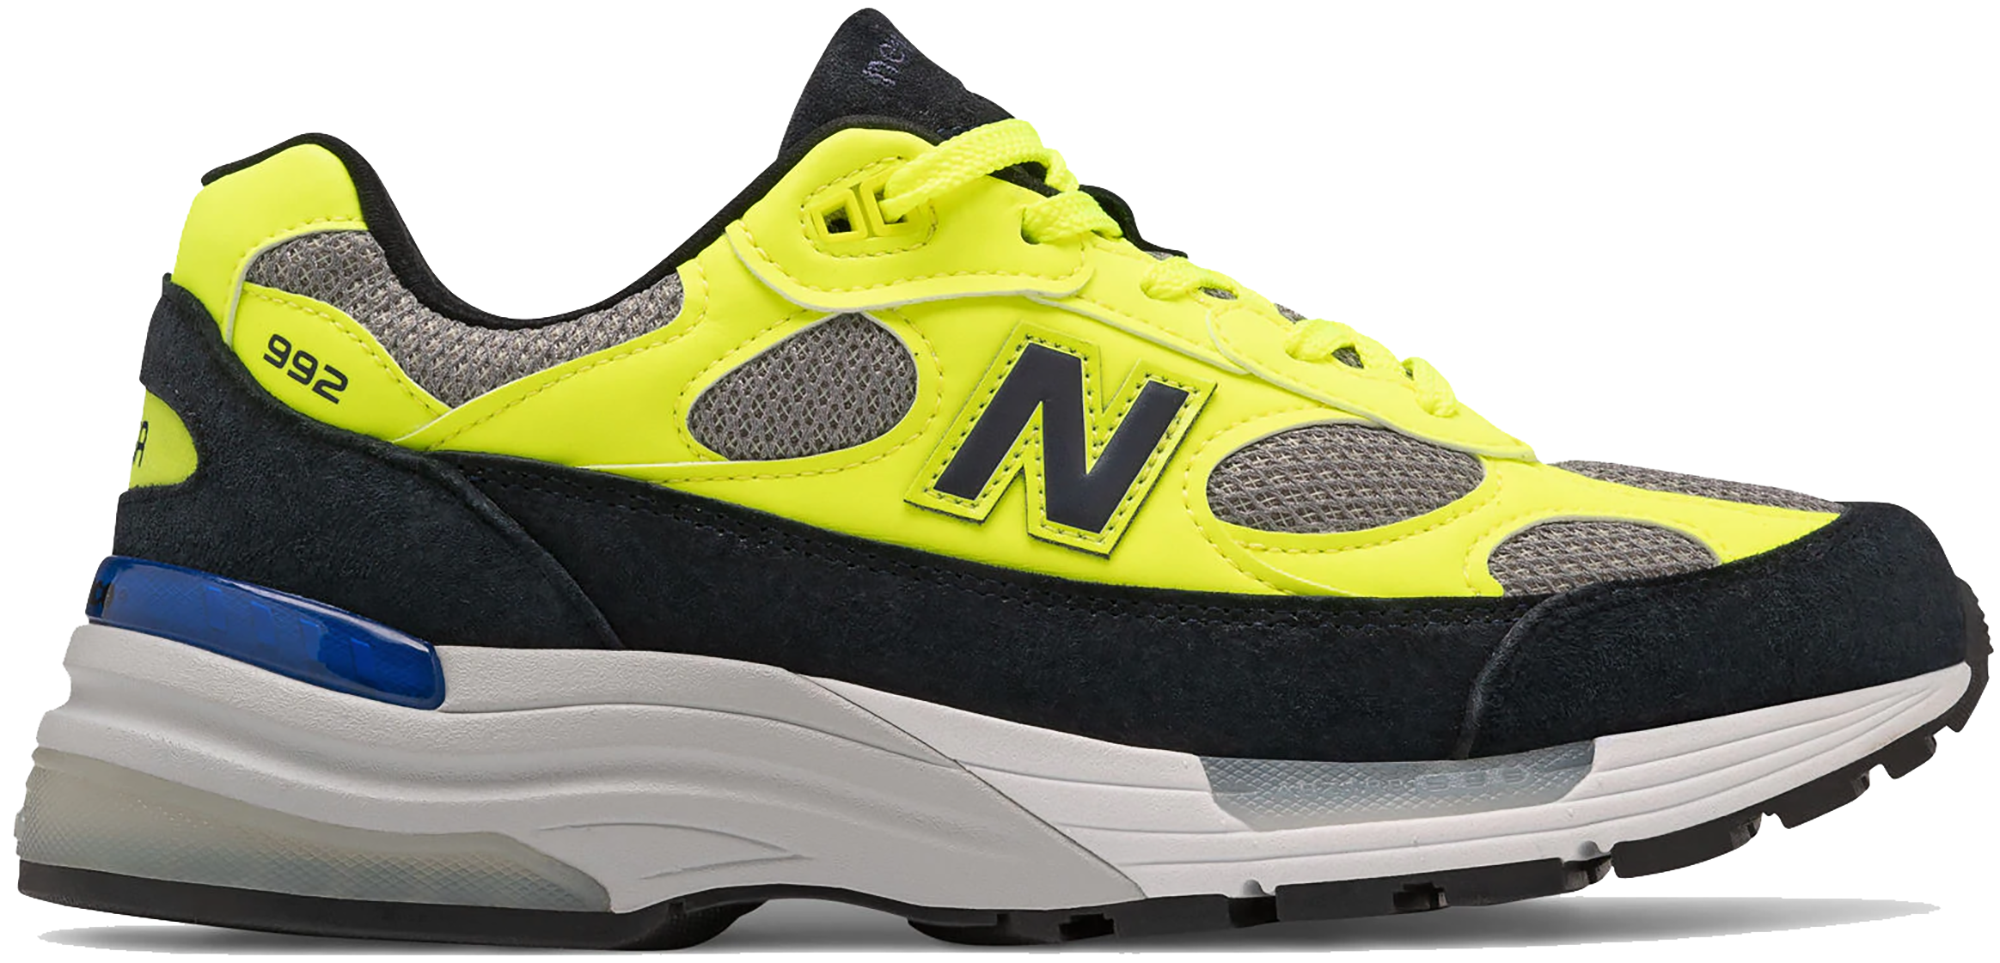 New Balance 992 Neon Yellow Black - M992AF